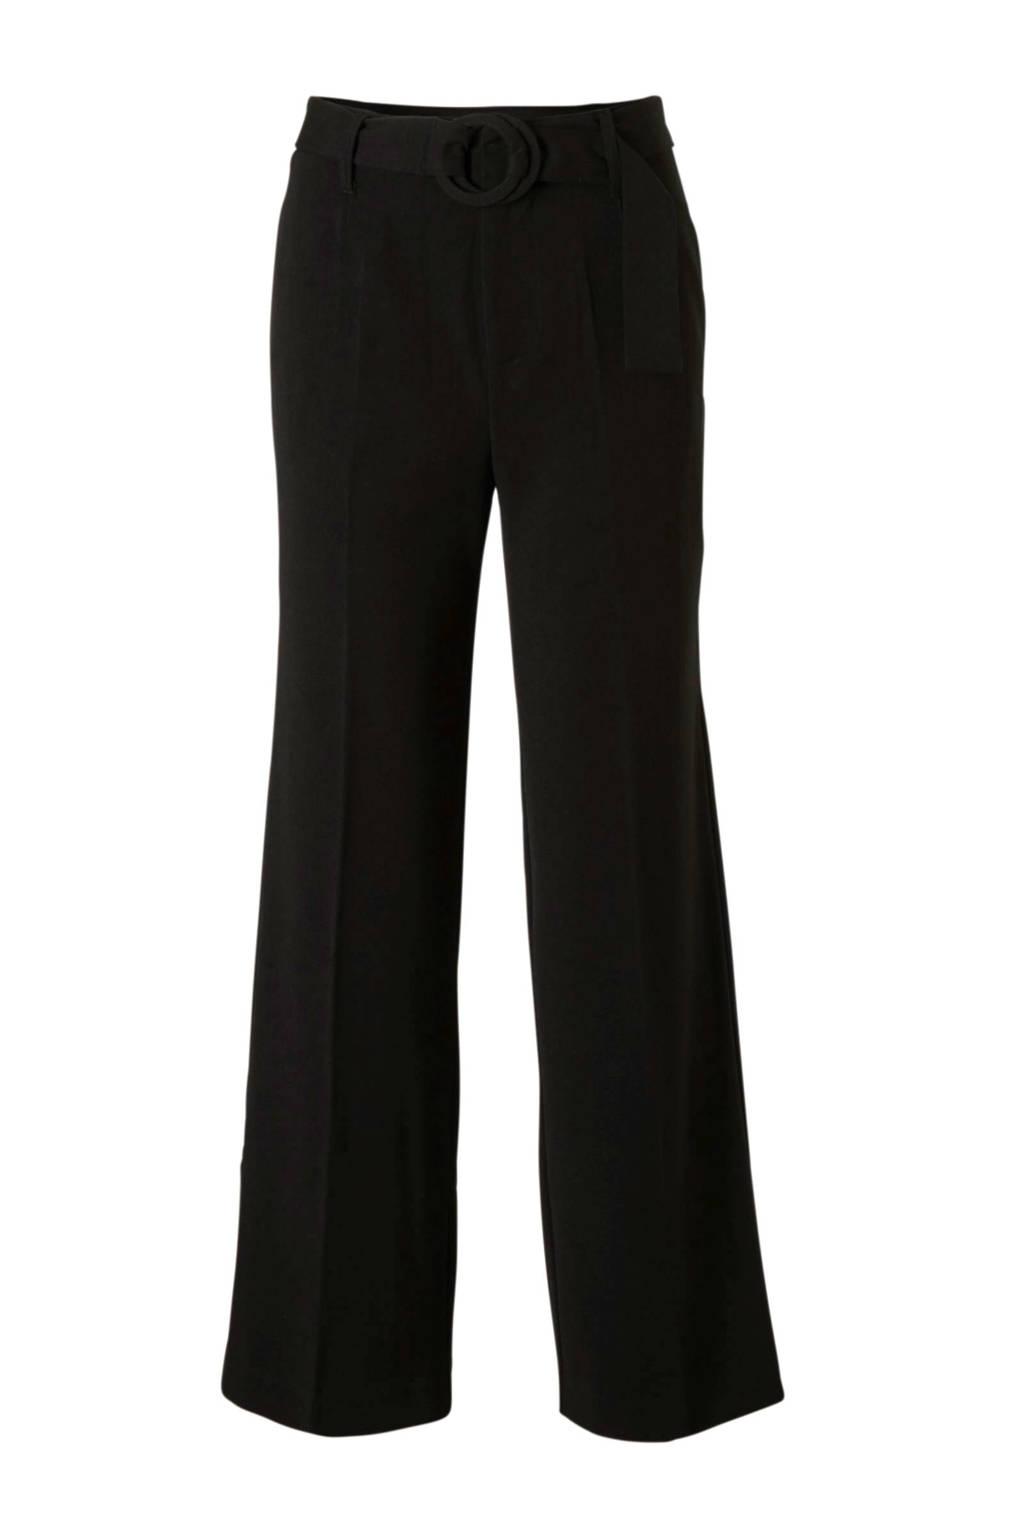 Mango high waist pantalon pantalon zwart, Zwart